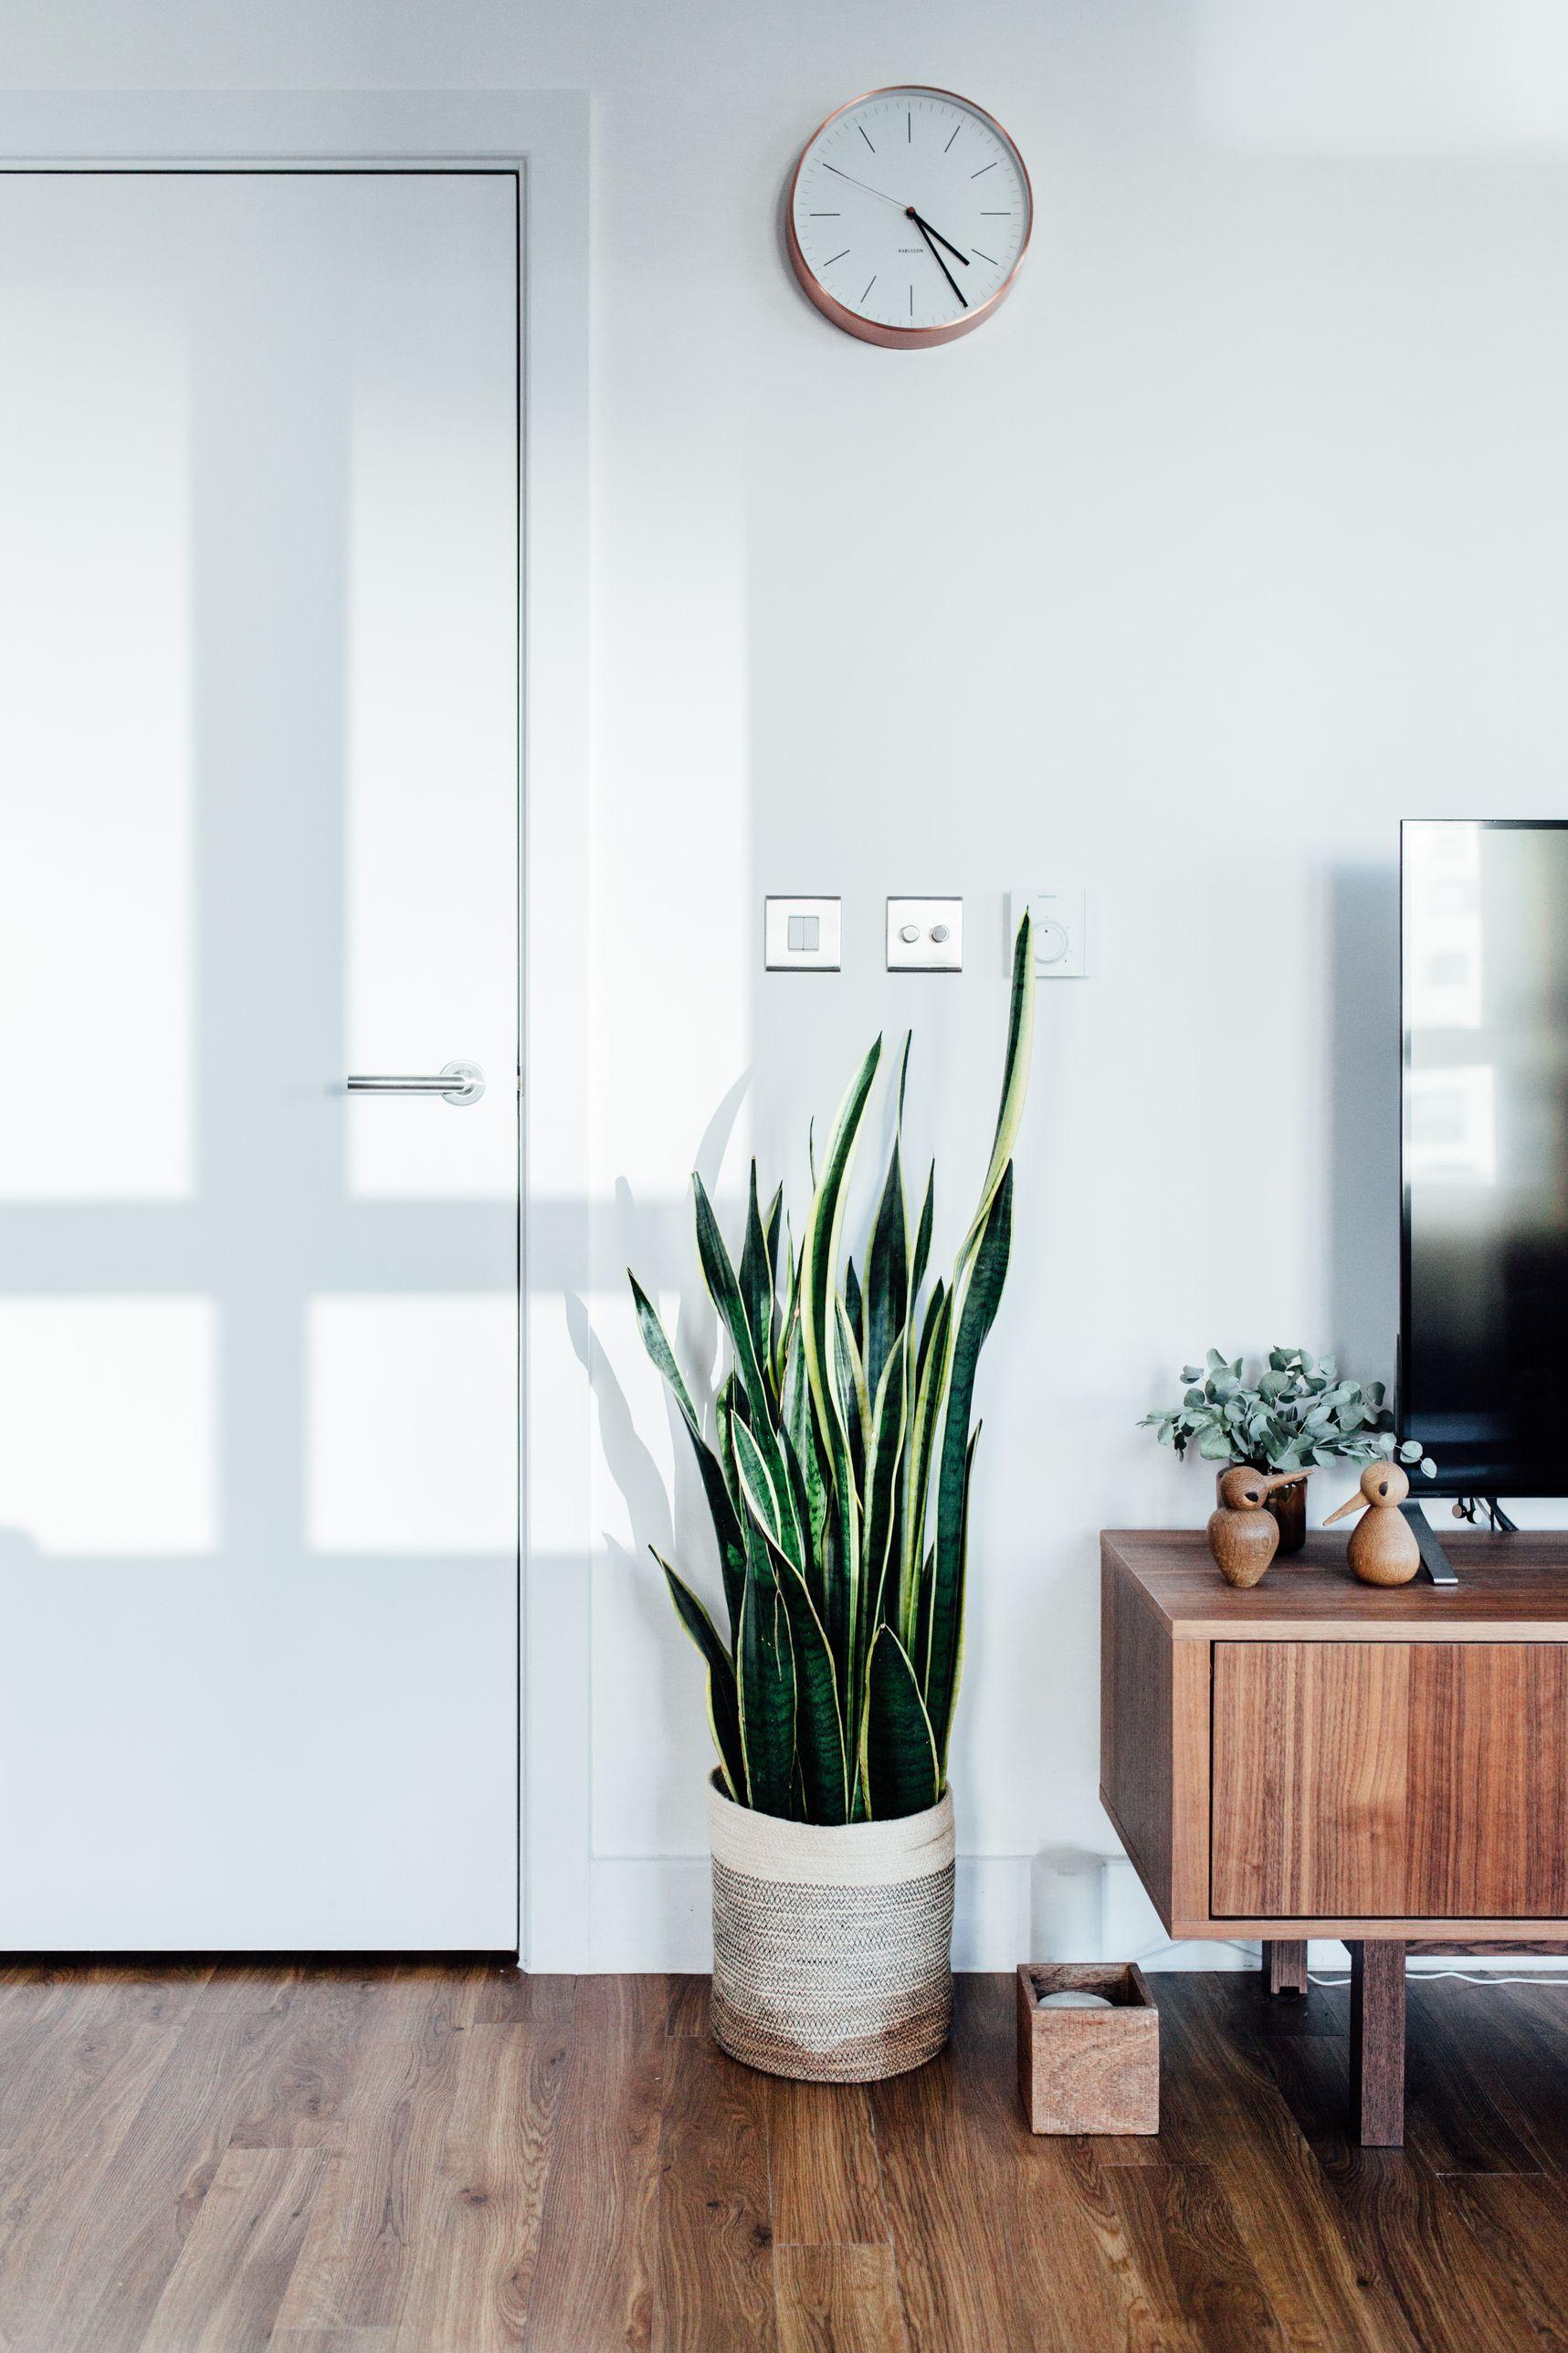 A corner of living room